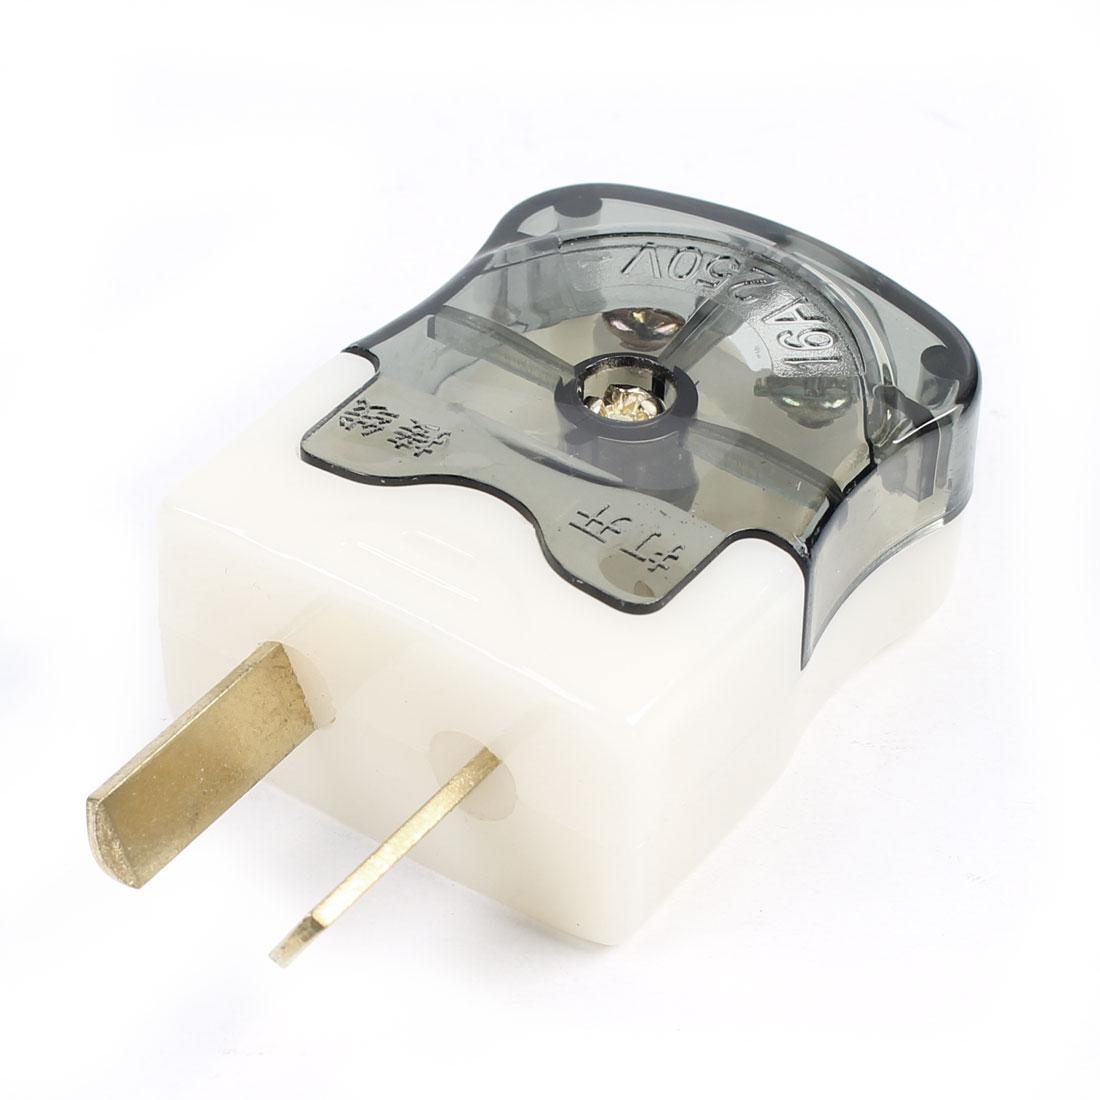 AU Plug AC 250V 16A Power Convertor White Gray Repair Parts